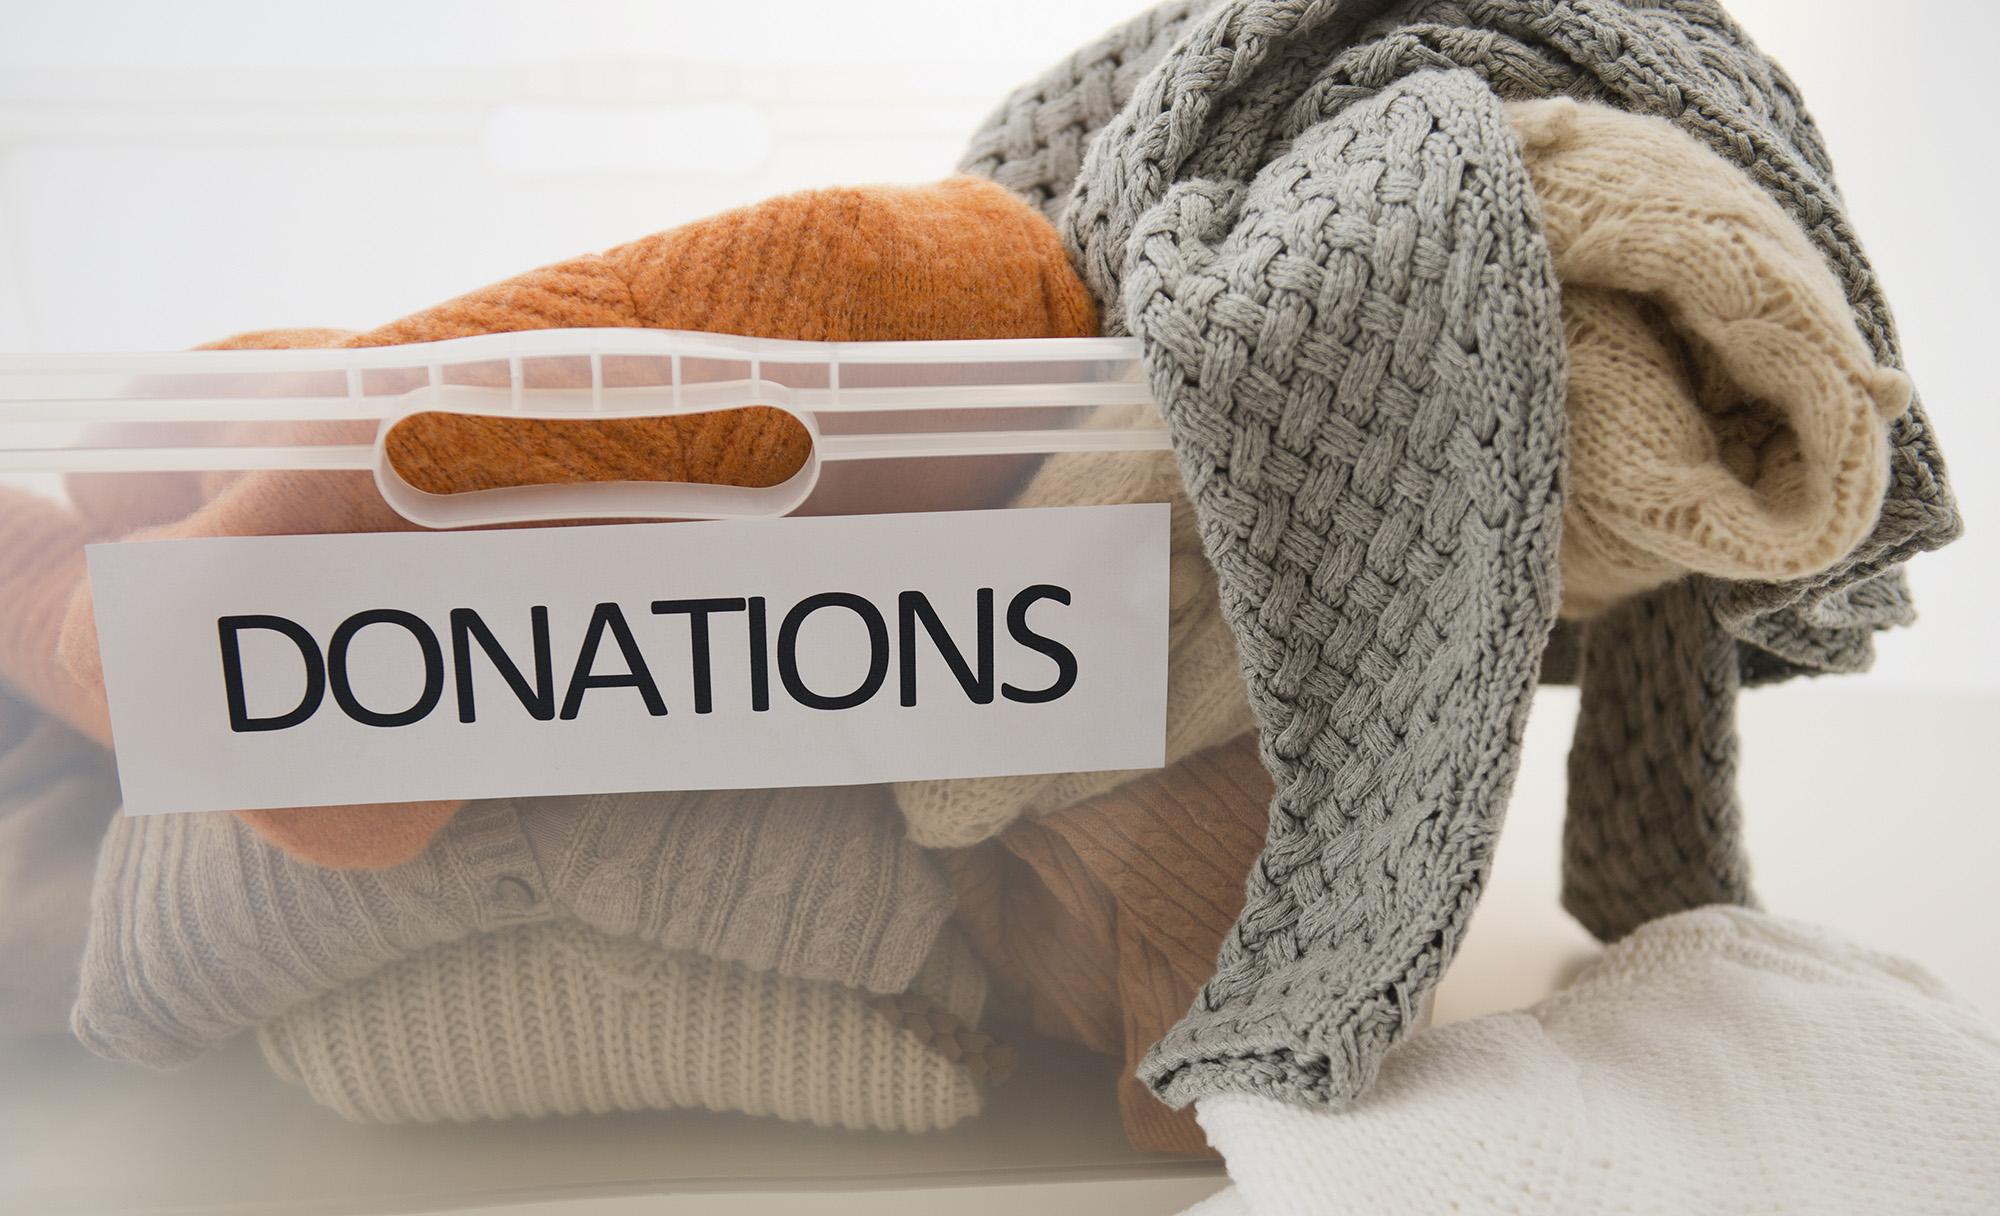 Donations bin